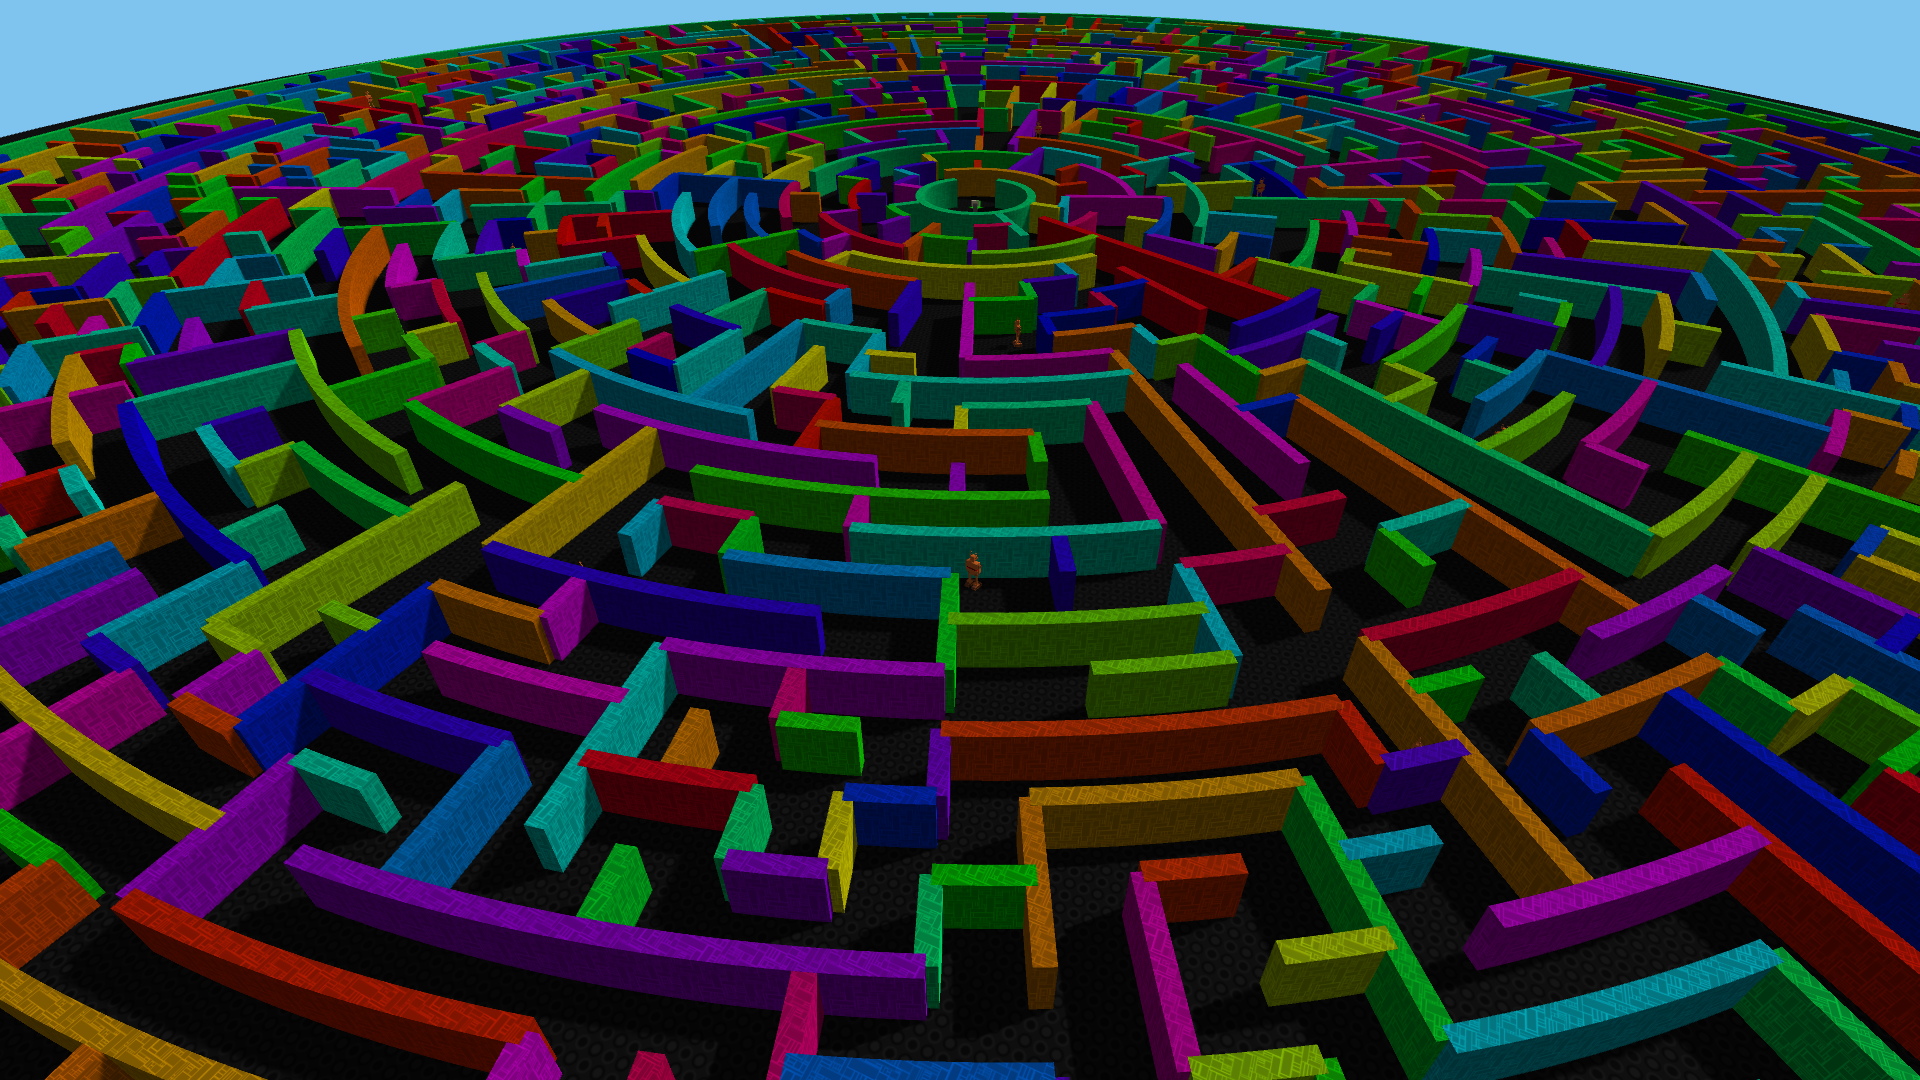 Mechanized Minotaur Circular Maze Demo by Poor Track Design